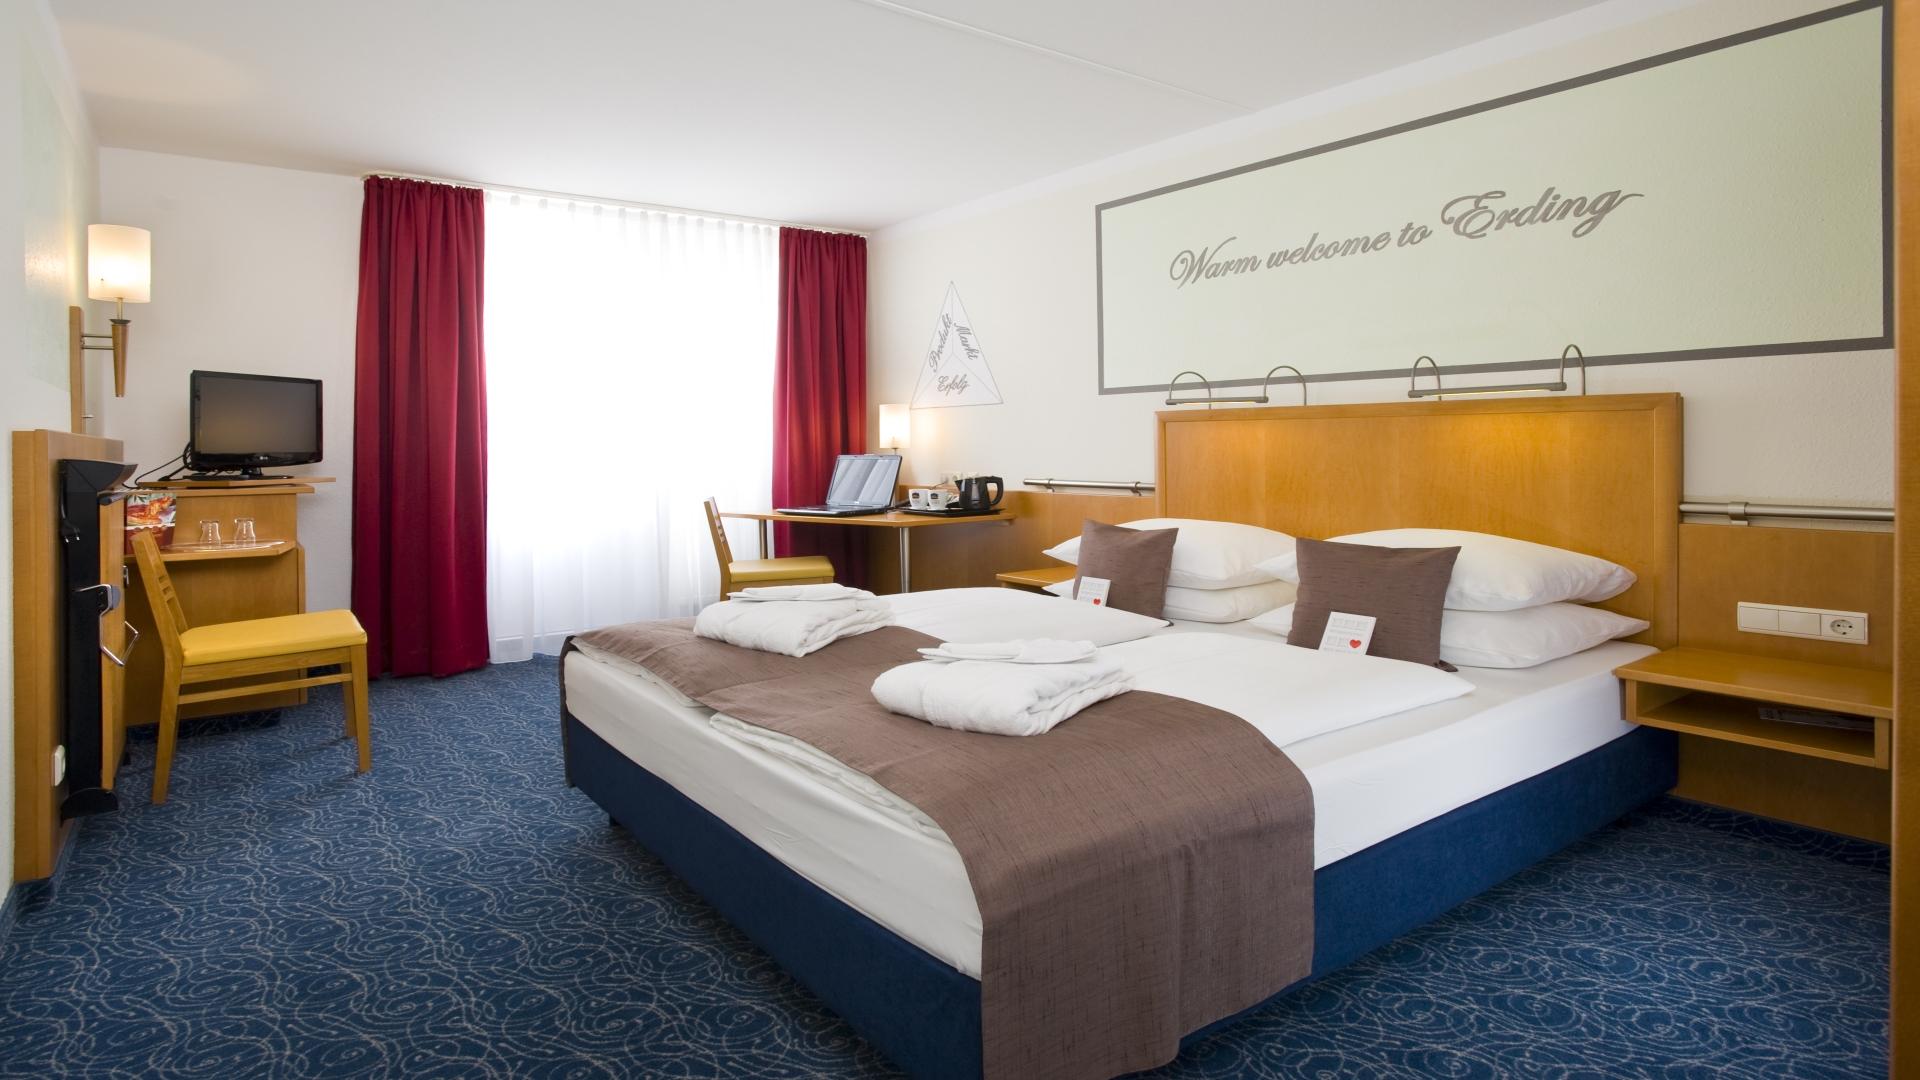 best western hotel m nchen airport hotels erding. Black Bedroom Furniture Sets. Home Design Ideas